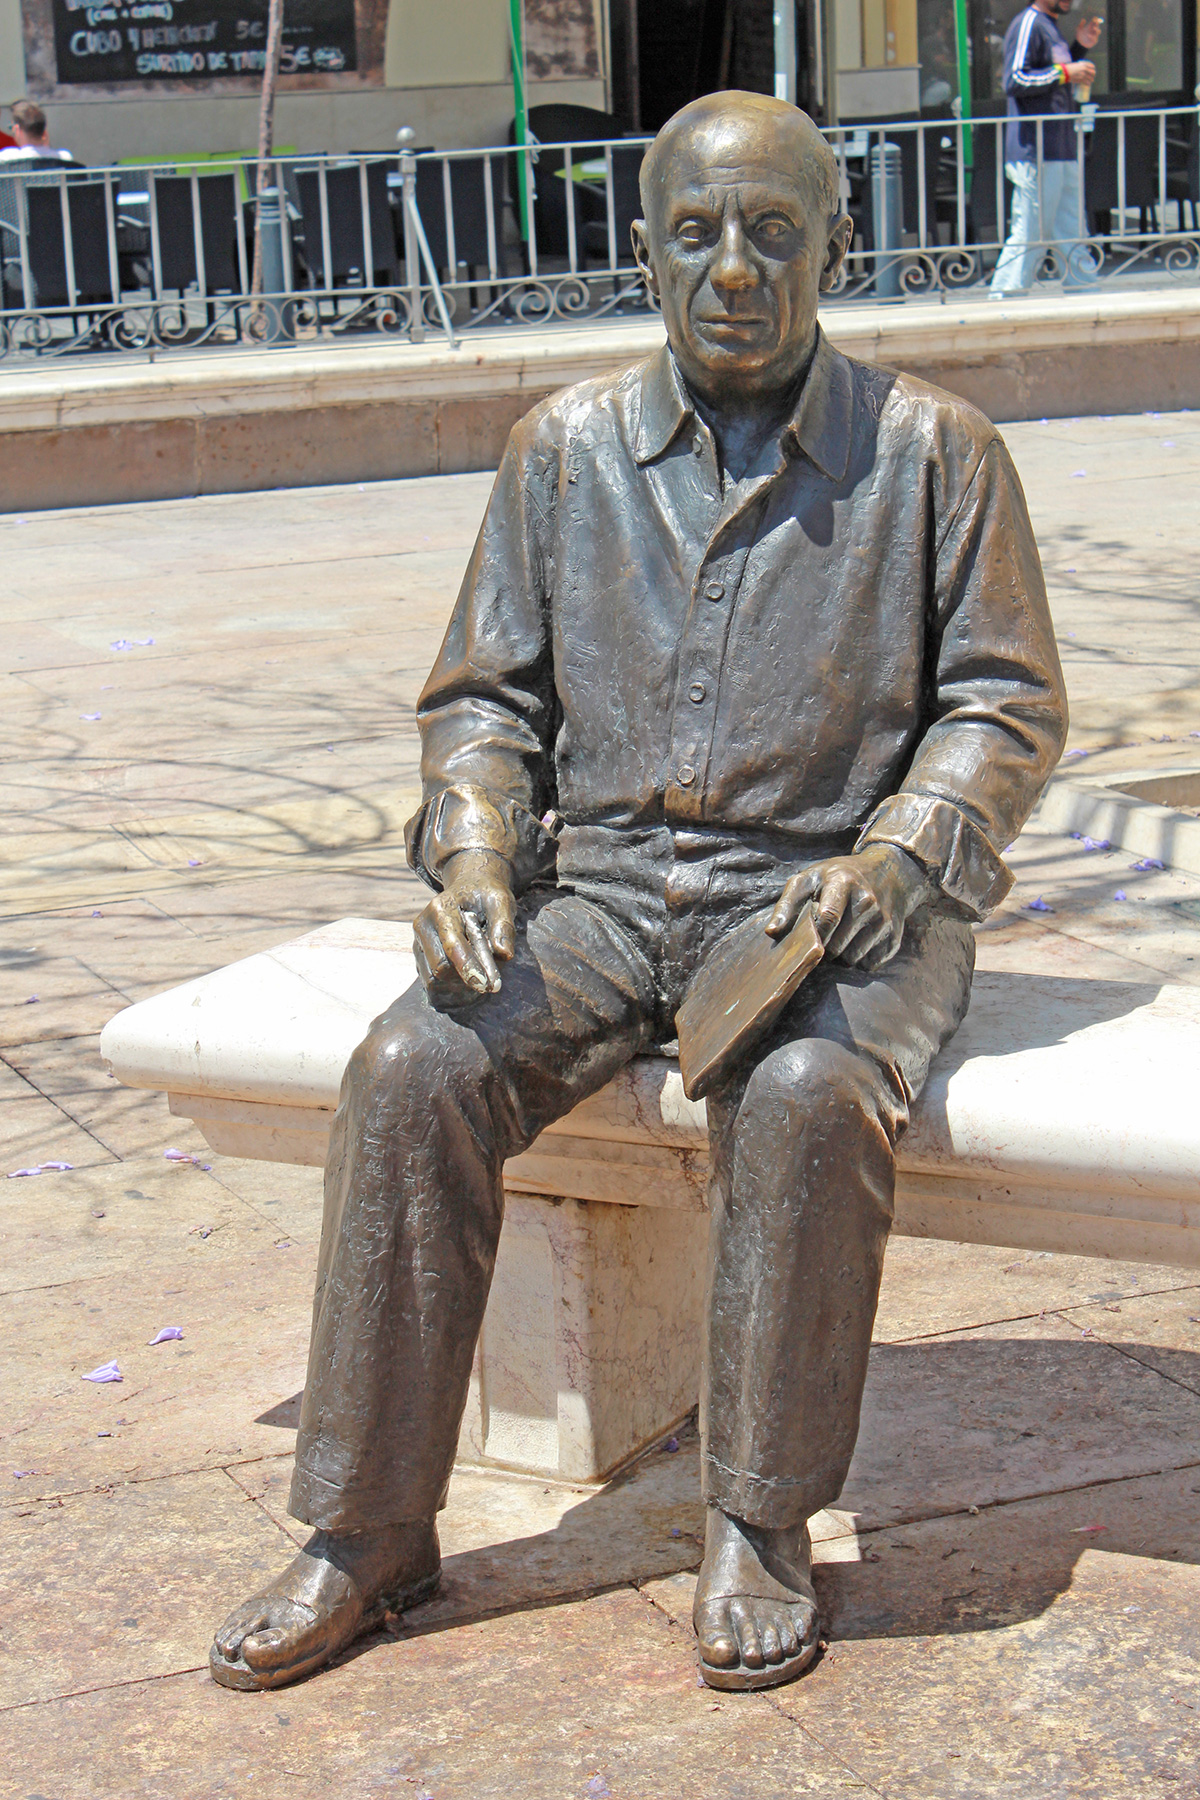 Life-size bronze statue of Pablo Picasso in Plaza de la Merced, adjacent to his family home